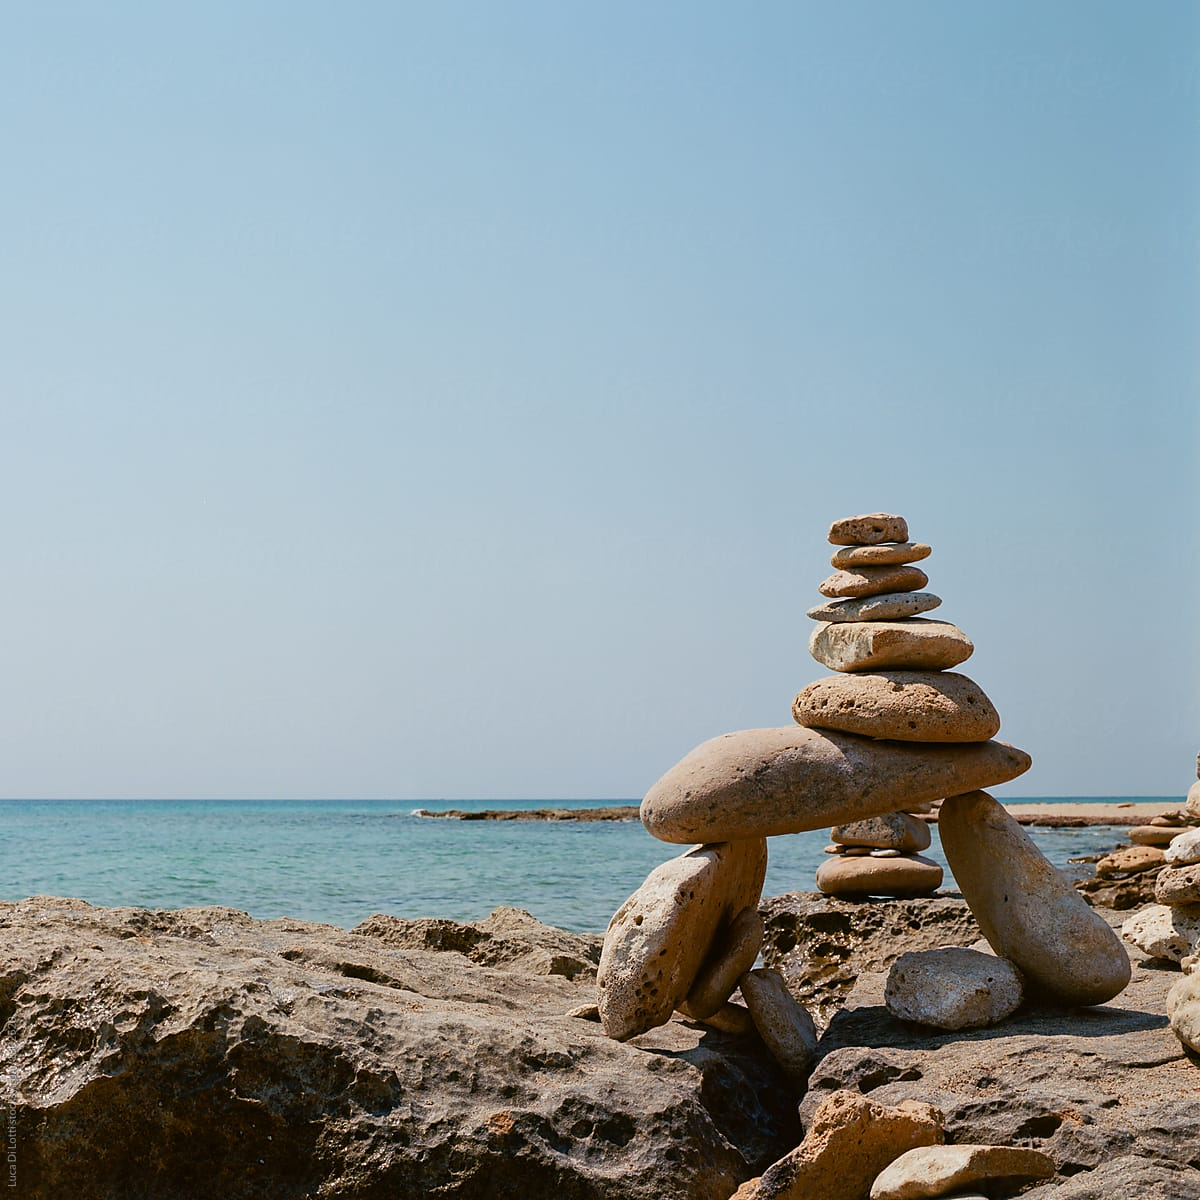 Stone Balancing Art By The Mediterranean Sea Shot On 120 Film